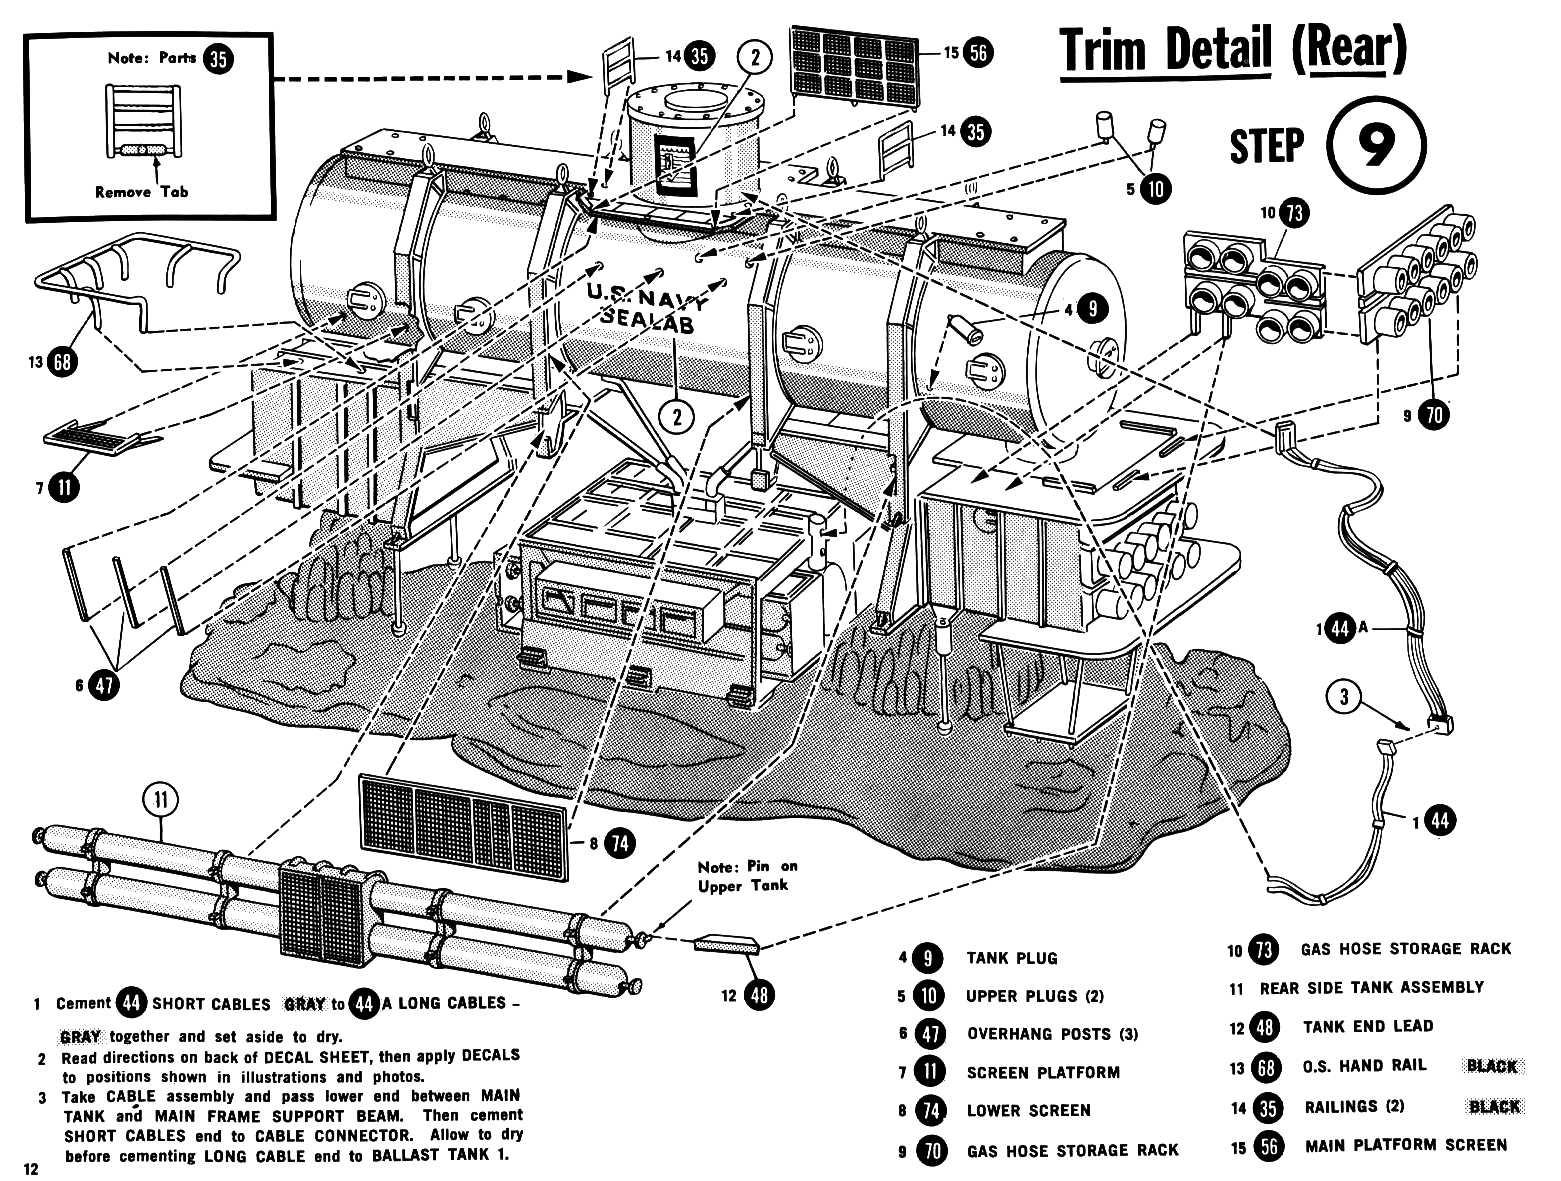 Sealab I Iii And Iii Us Navy Underwater Research Laboratoy